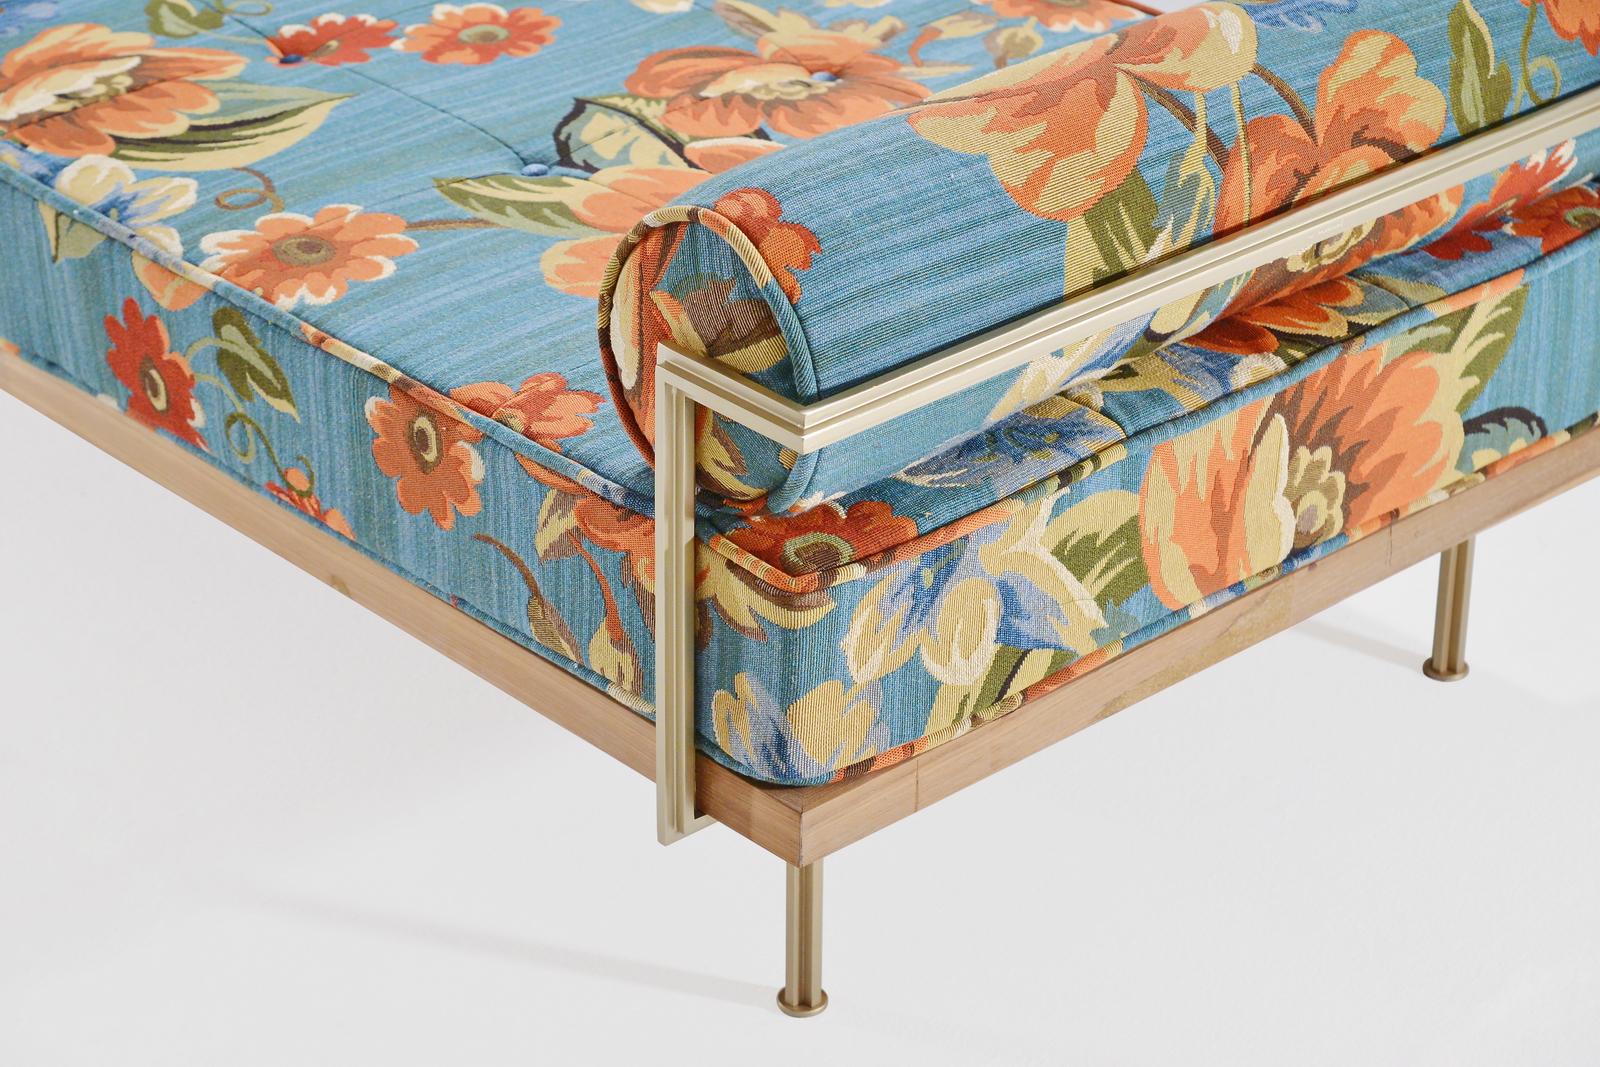 PTendercool-Sofa-PT76-BS1-TE-NO-JD&CO (Garden Tapestry)-190903-06